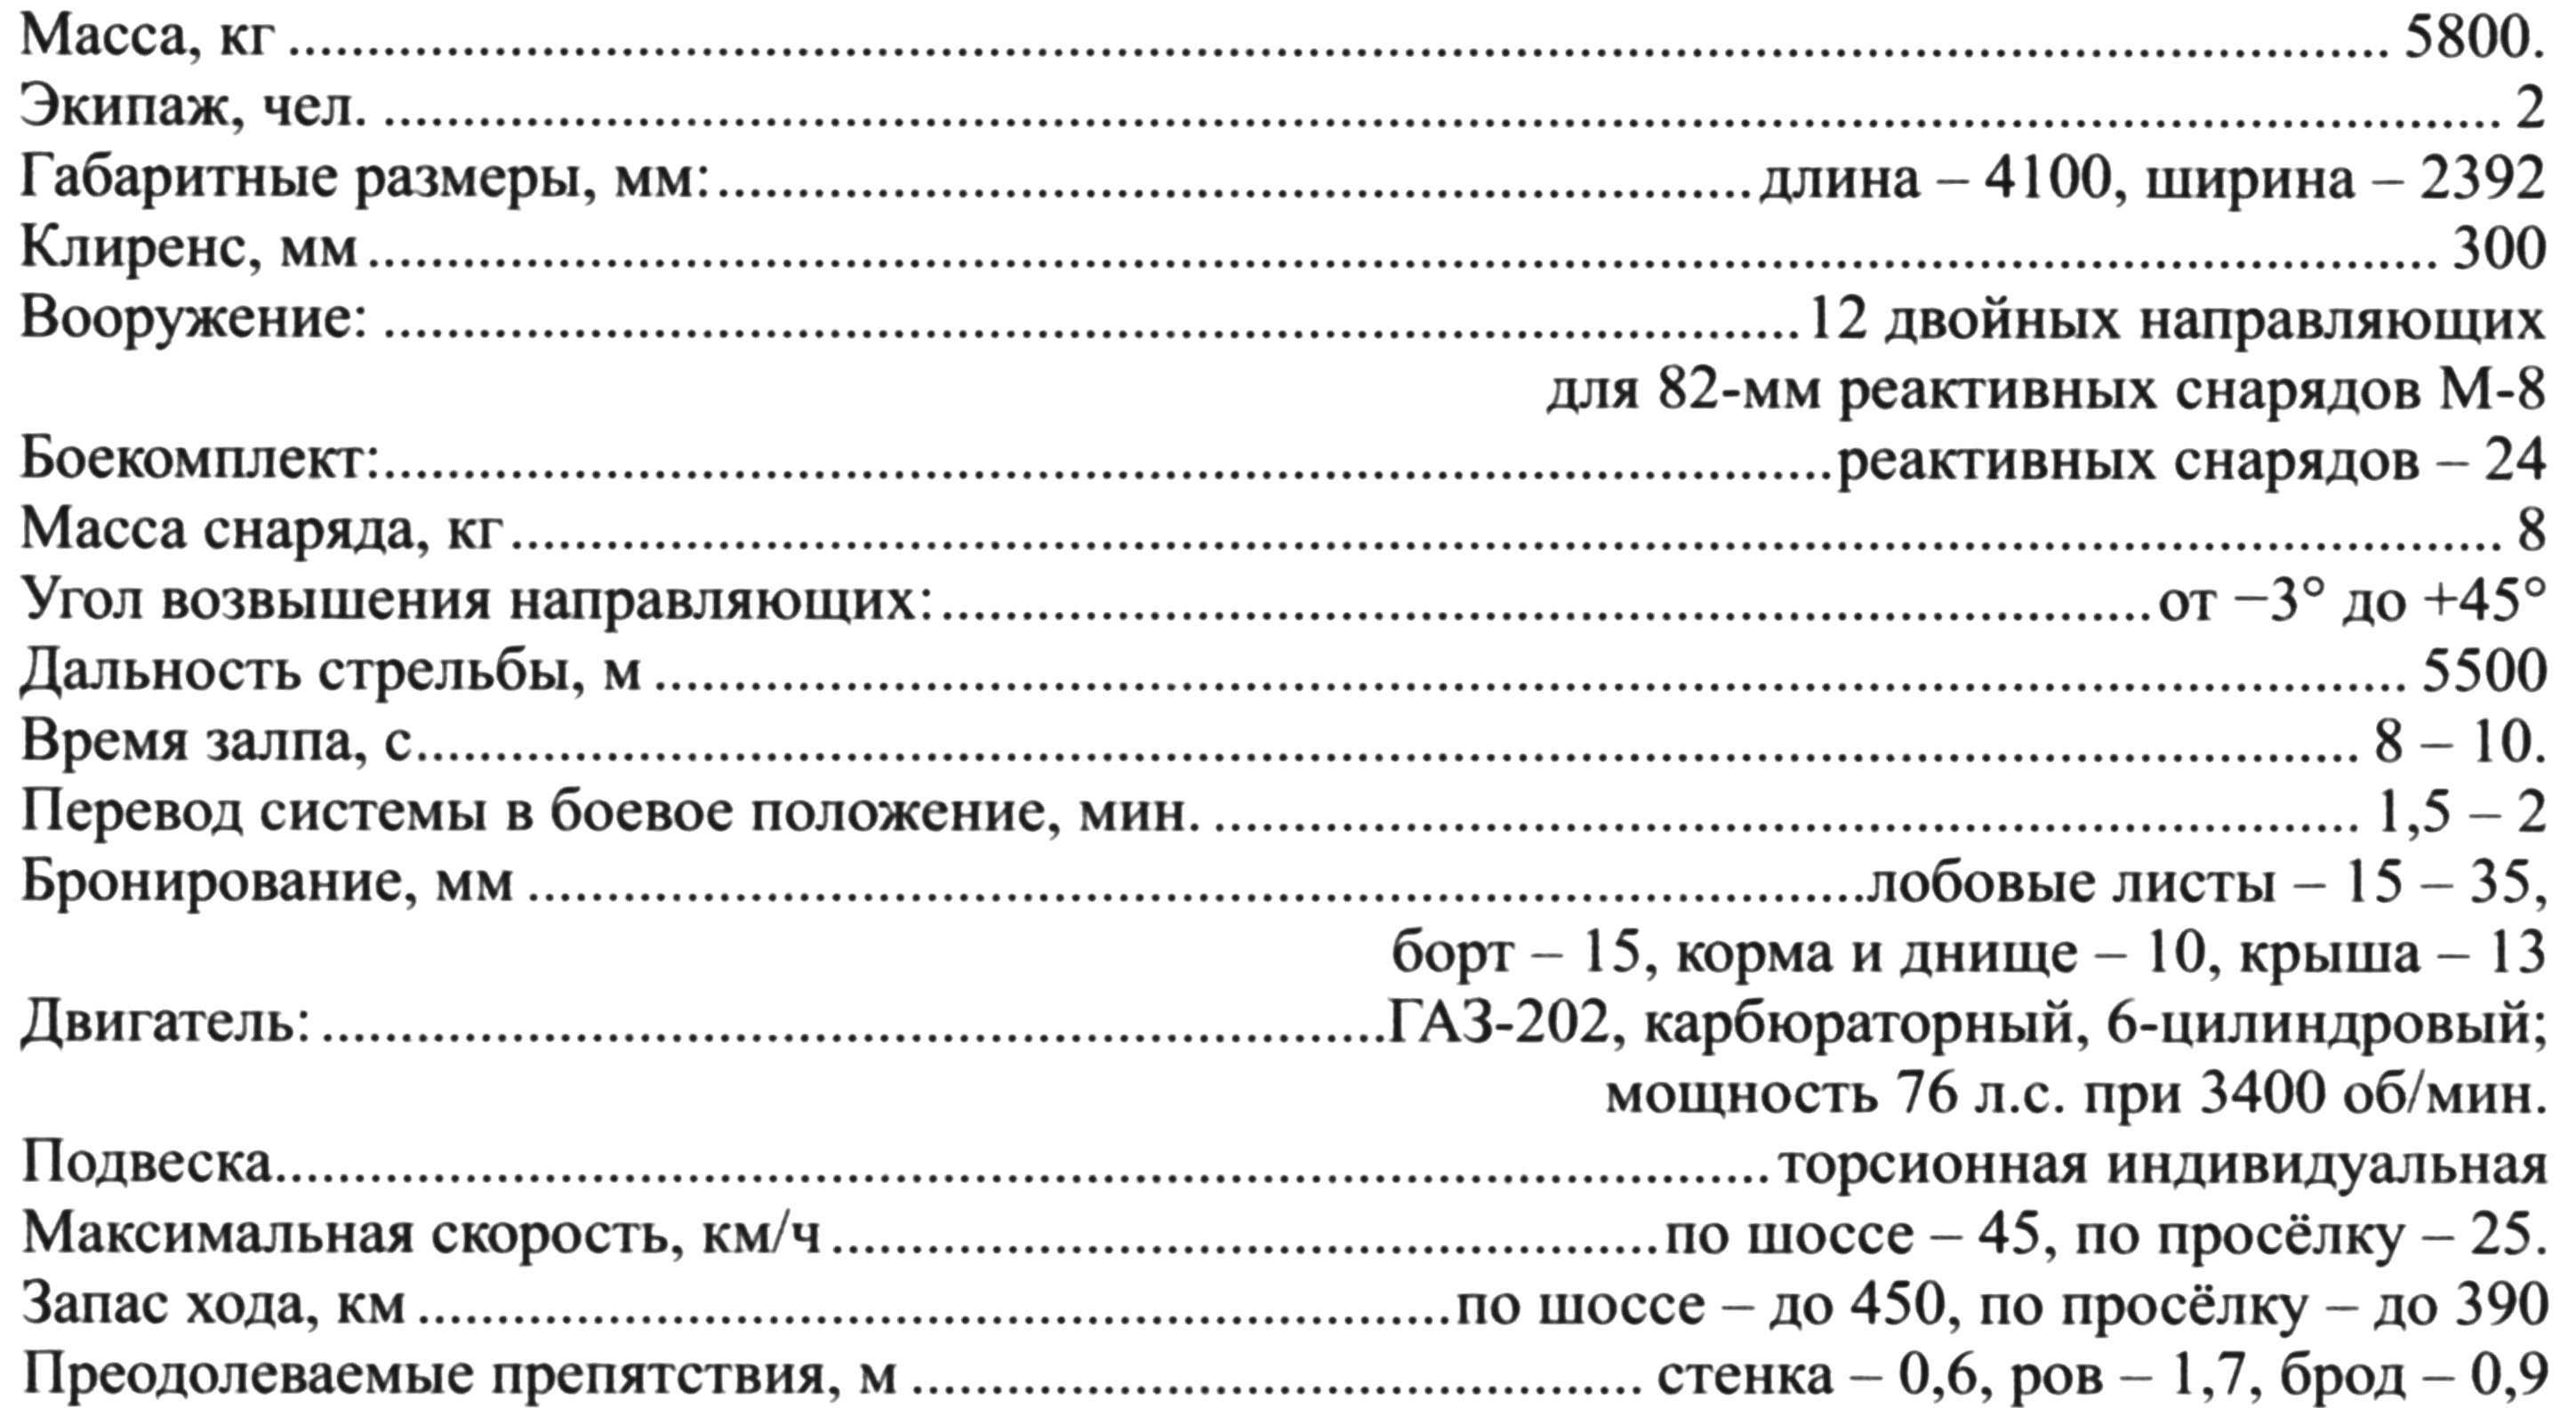 Тактико-технические характеристики БМ-8-24 на базе Т-60